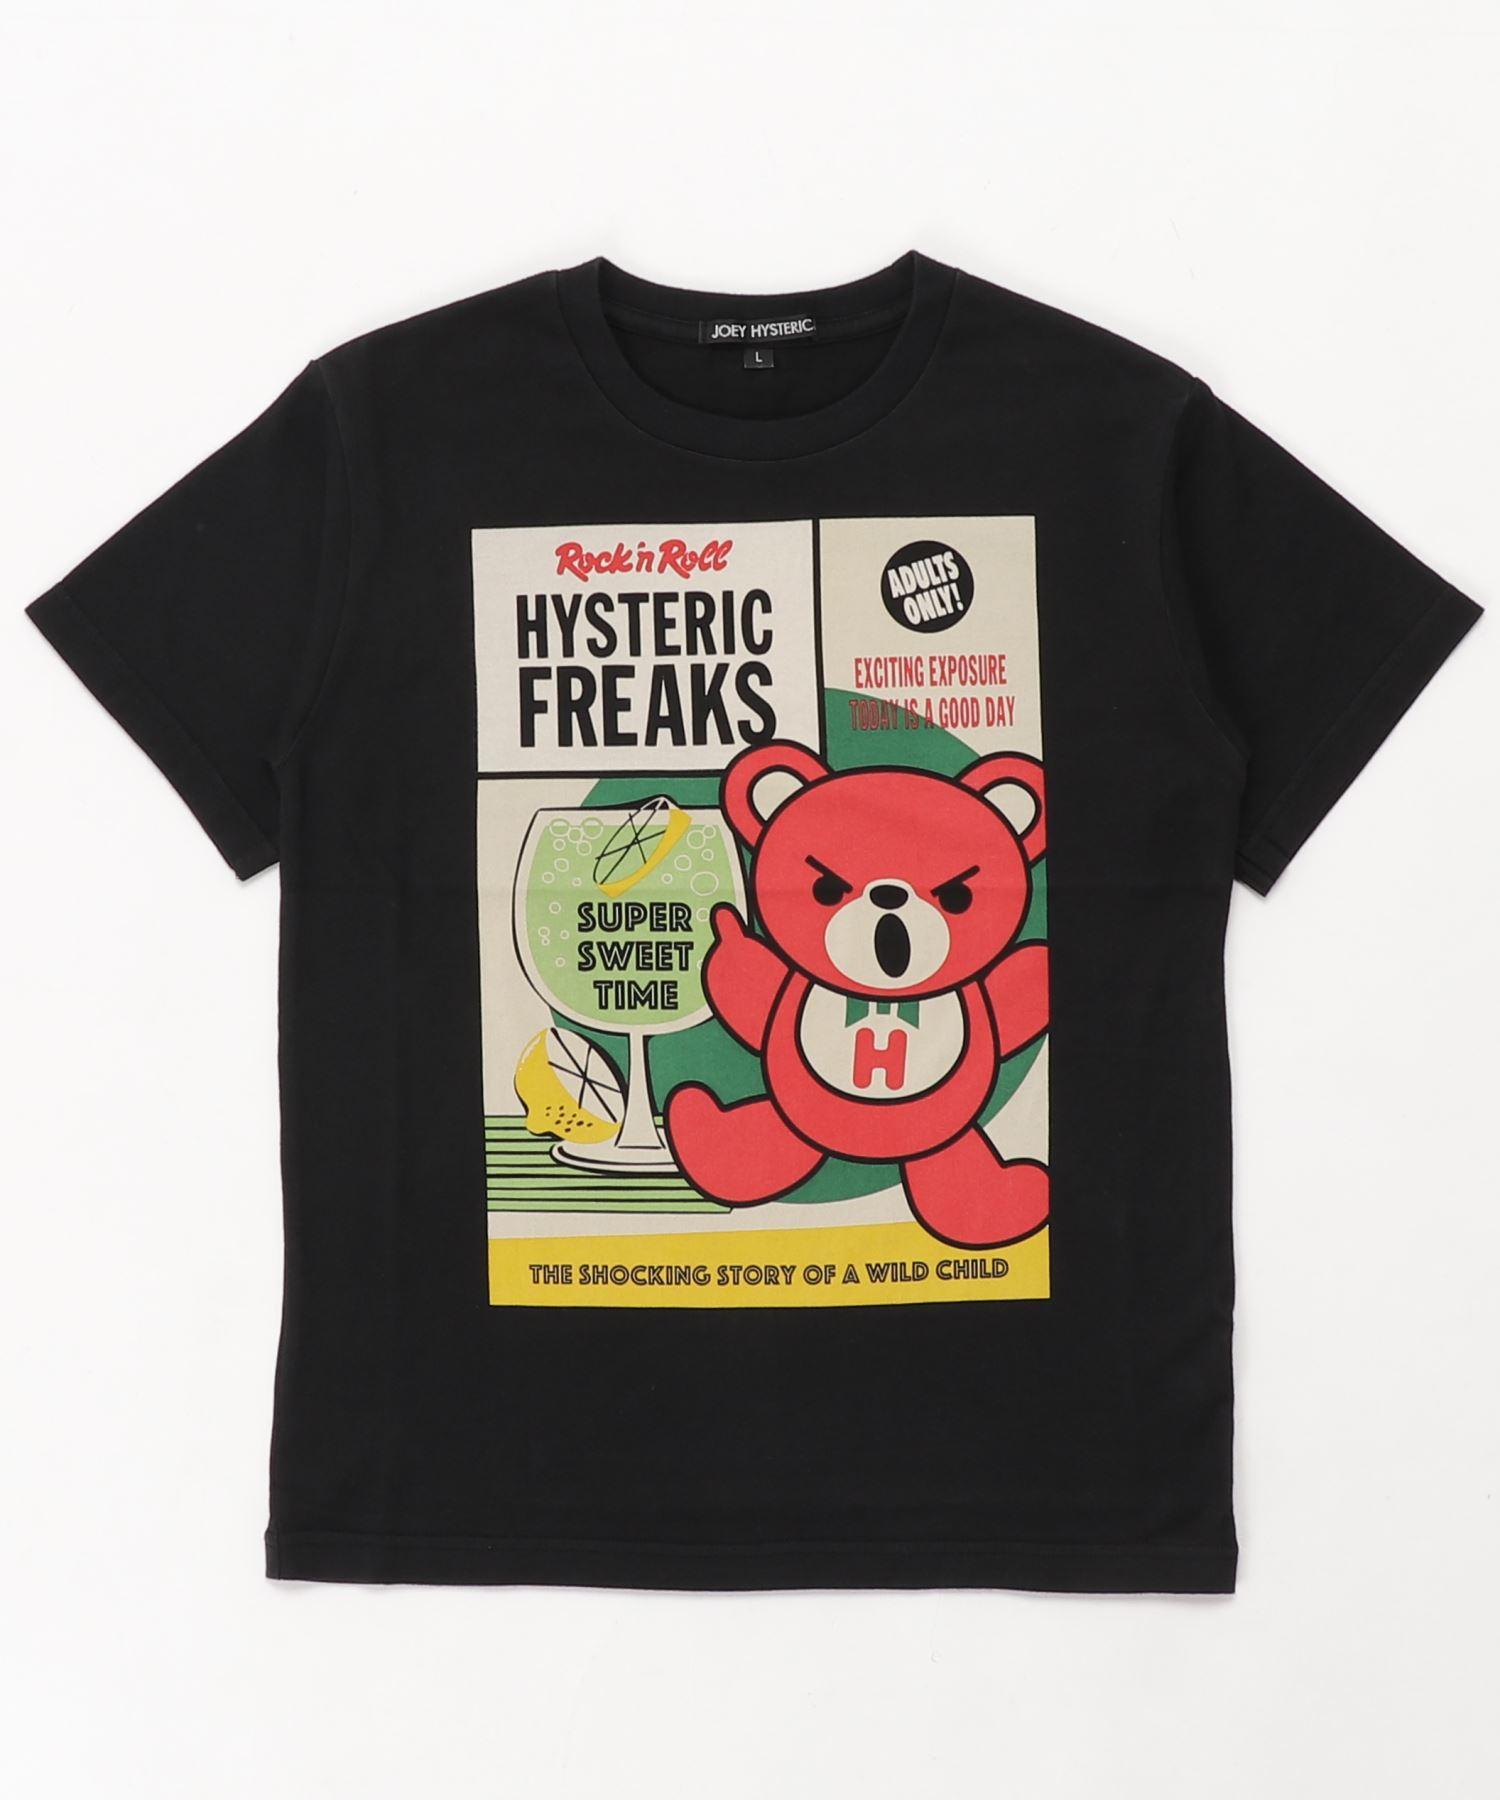 HYSTERIC FREAKS pt Tシャツ【L】